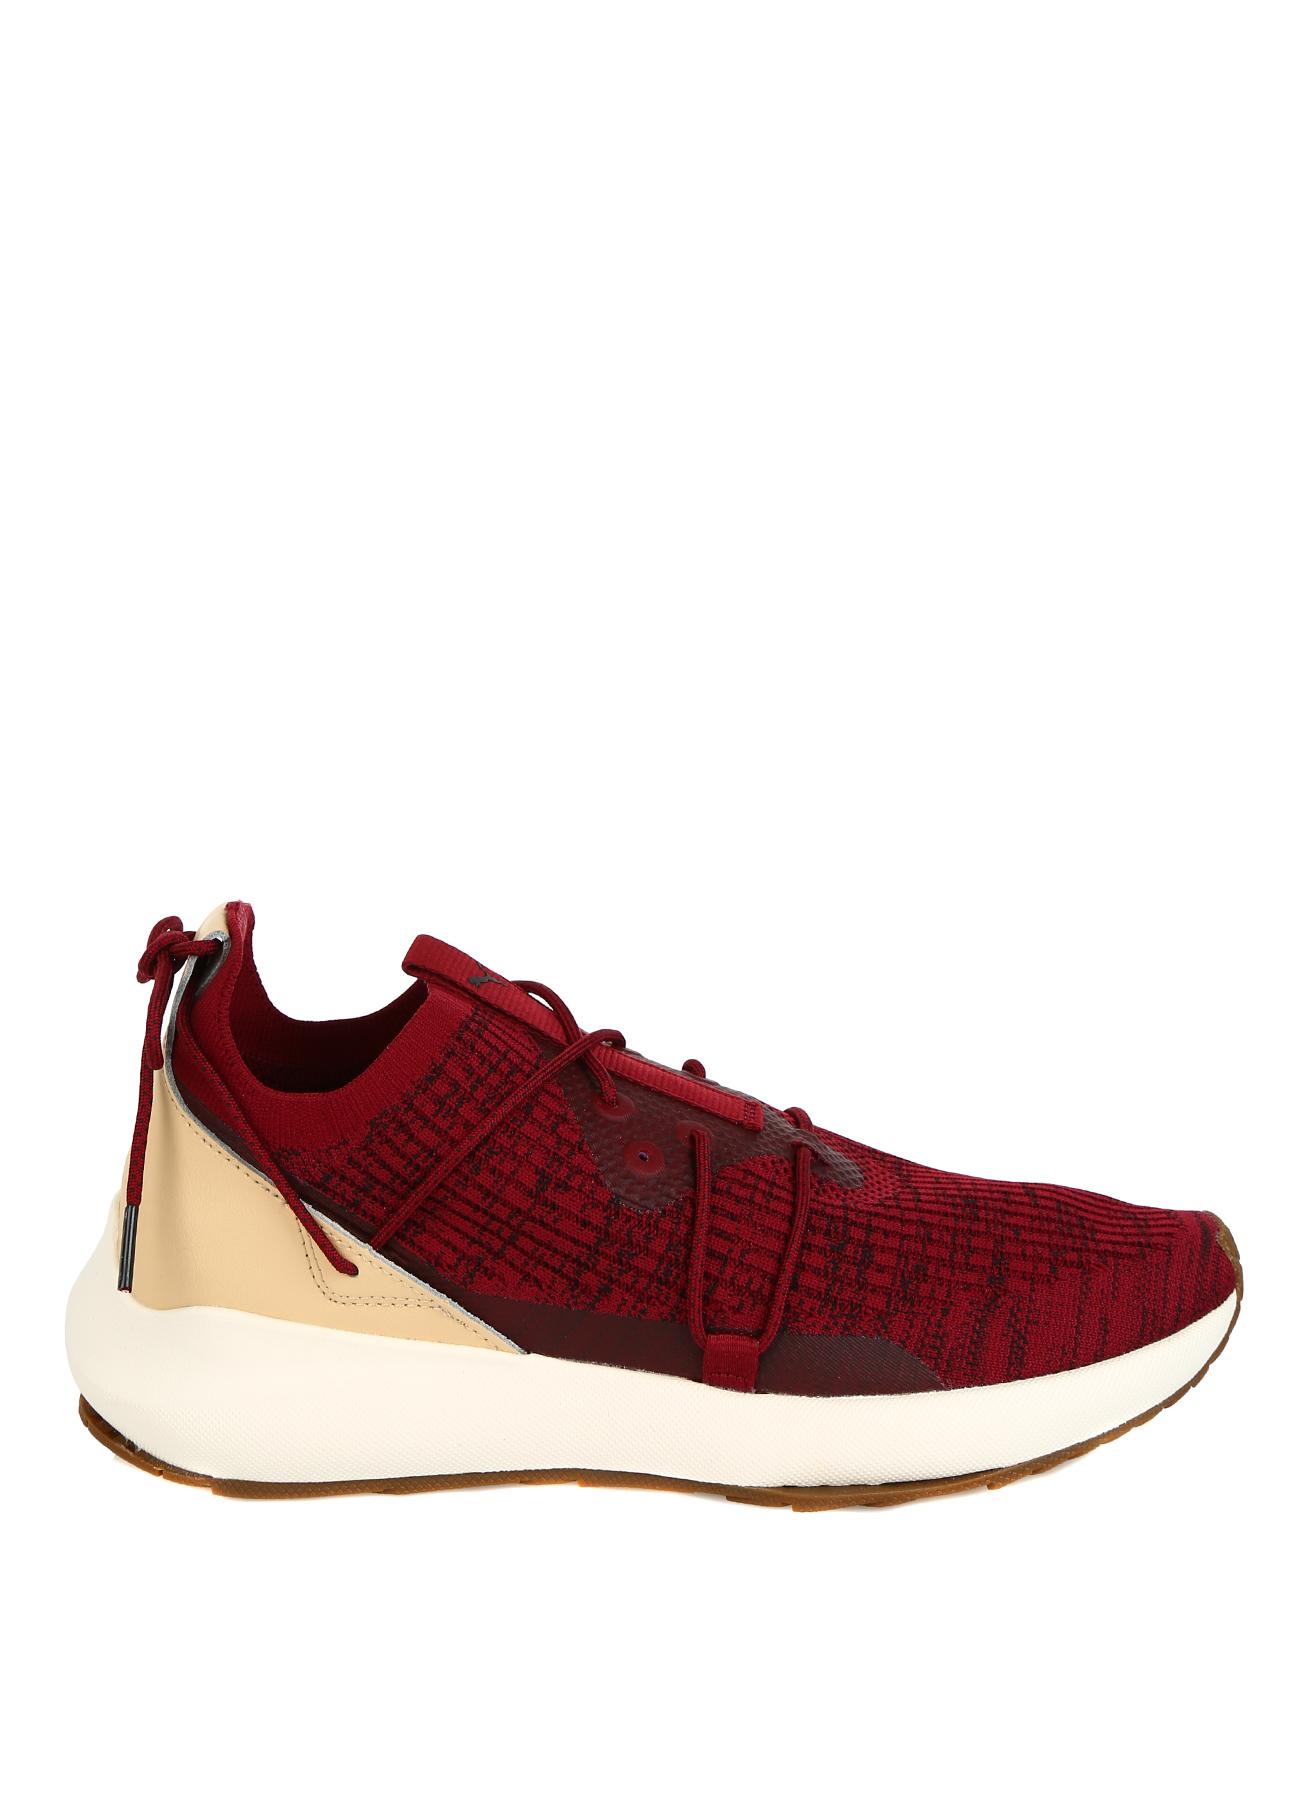 Puma SF Evo Cat ll Sock Ls Lifestyle Ayakkabı 40.5 5001632597001 Ürün Resmi